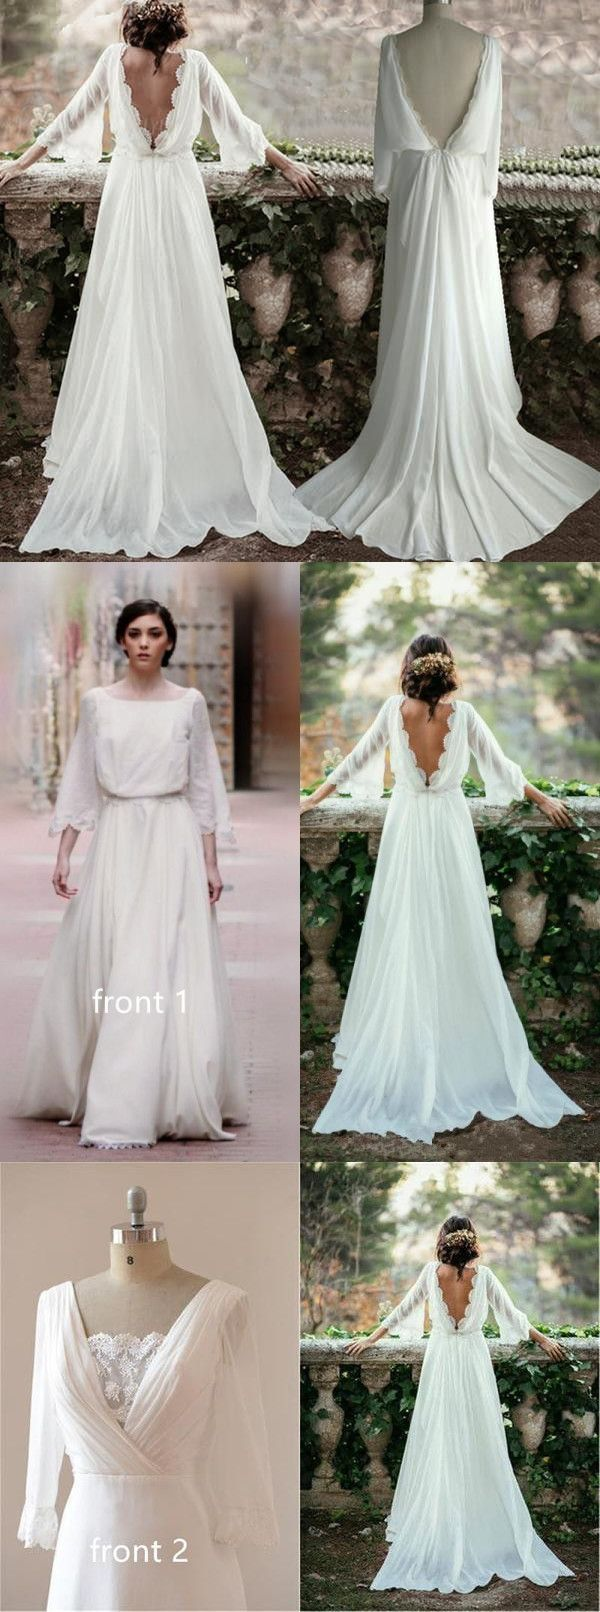 Antique cream wedding dress  Lace Backless Wedding DressVintage Wedding DressLong Sleeve Bridal